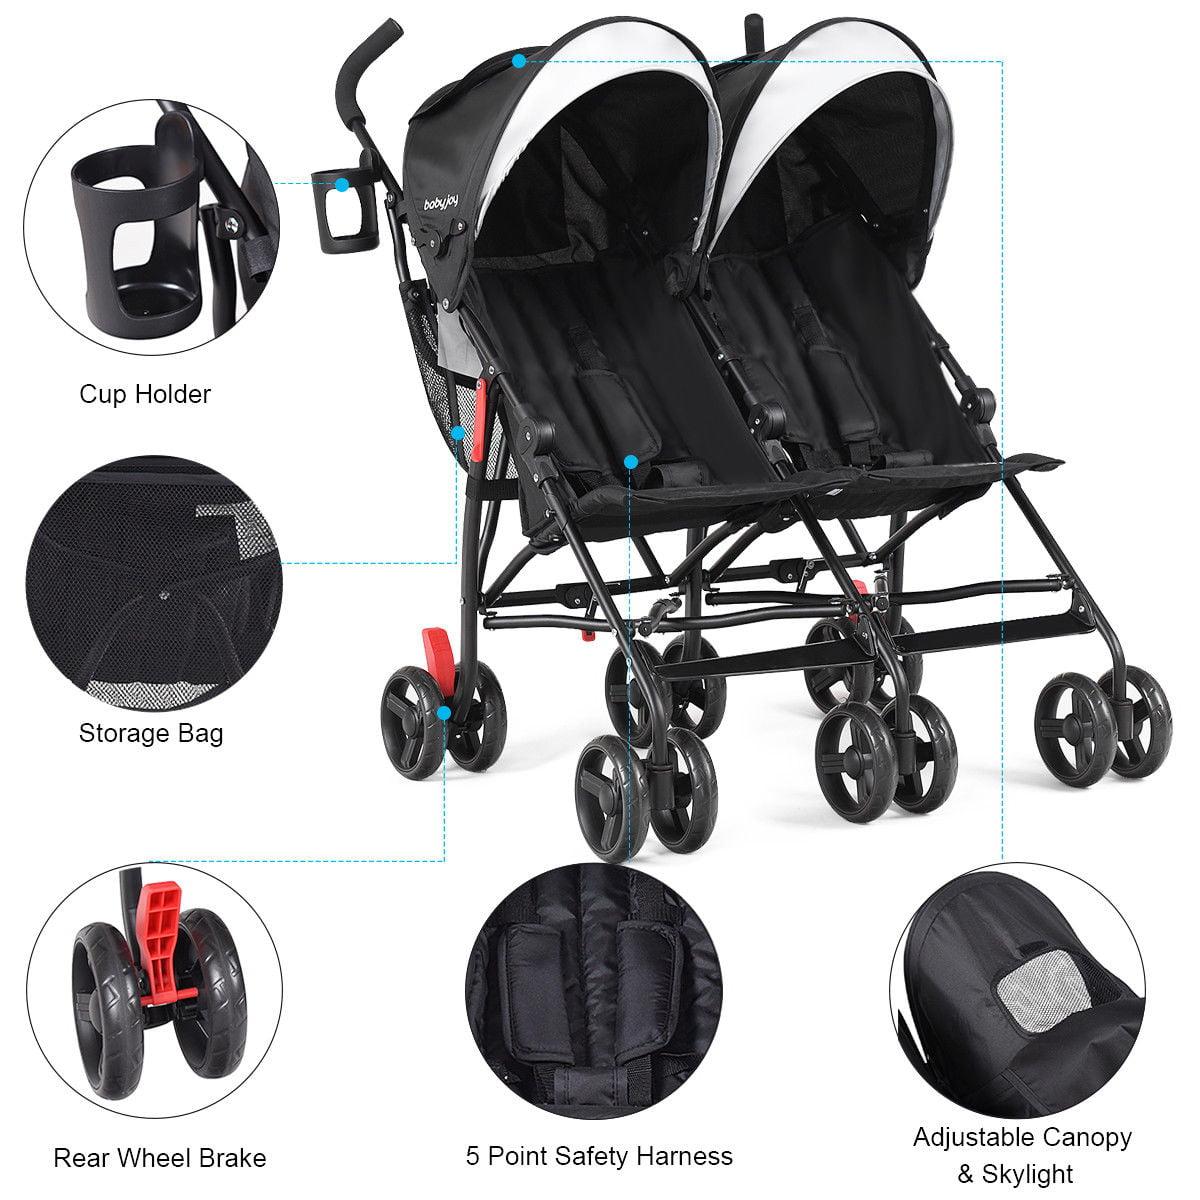 Baby-joy Foldable Twin Baby Double Stroller Kids Ultralight Umbrella Stroller Pushchair by Costway